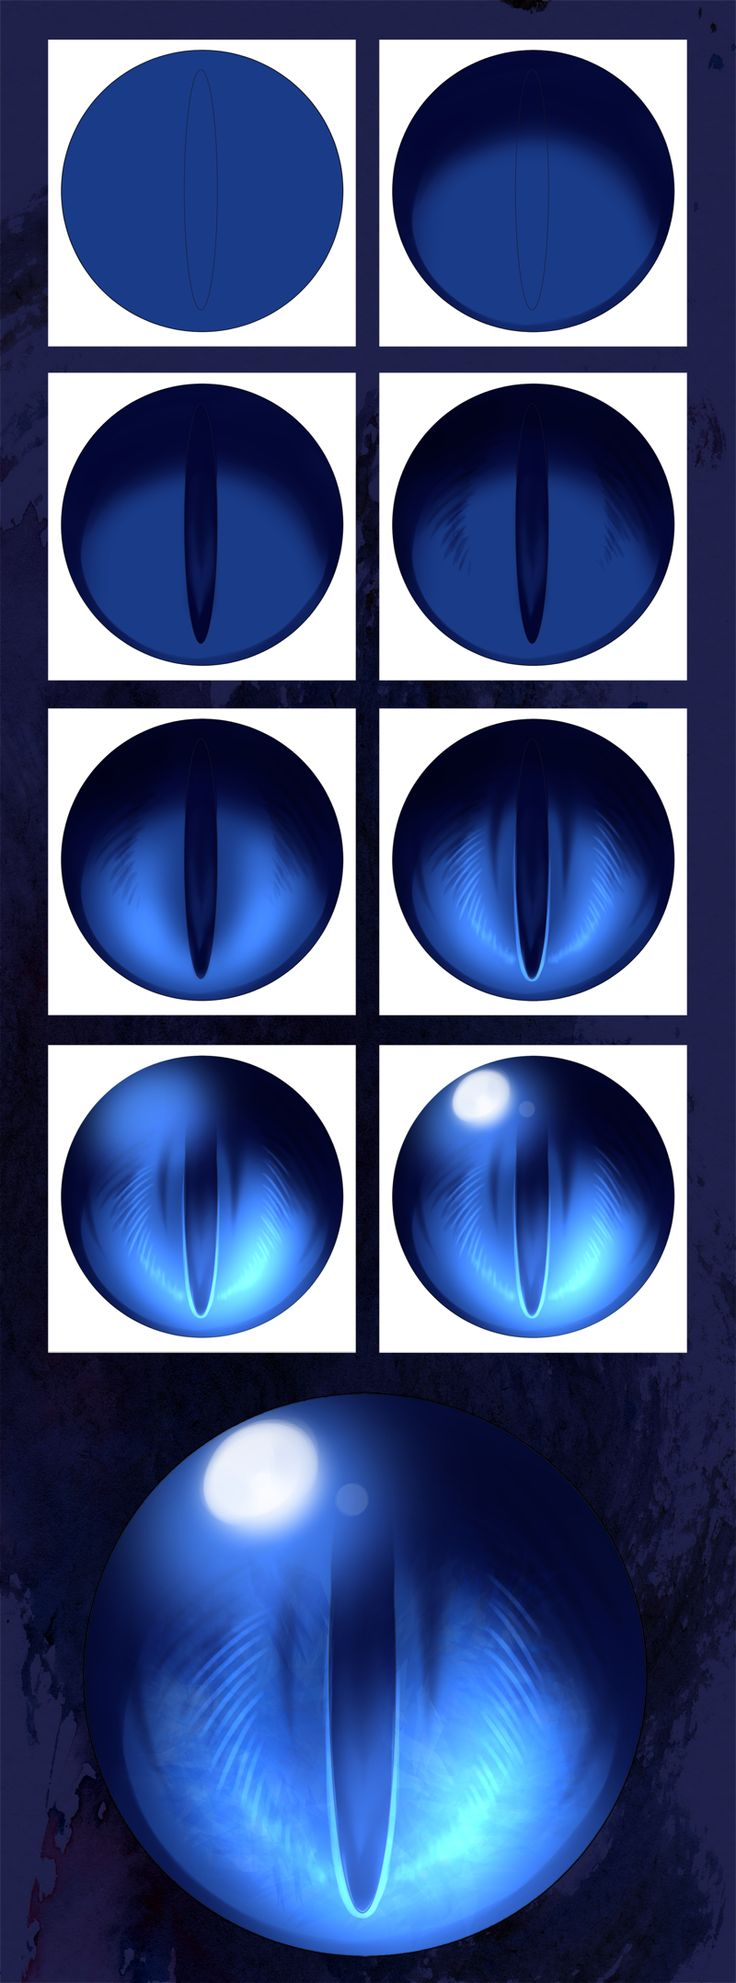 Step by Step Dragon Eye Orb by Dea-89.deviantart.com on @DeviantArt